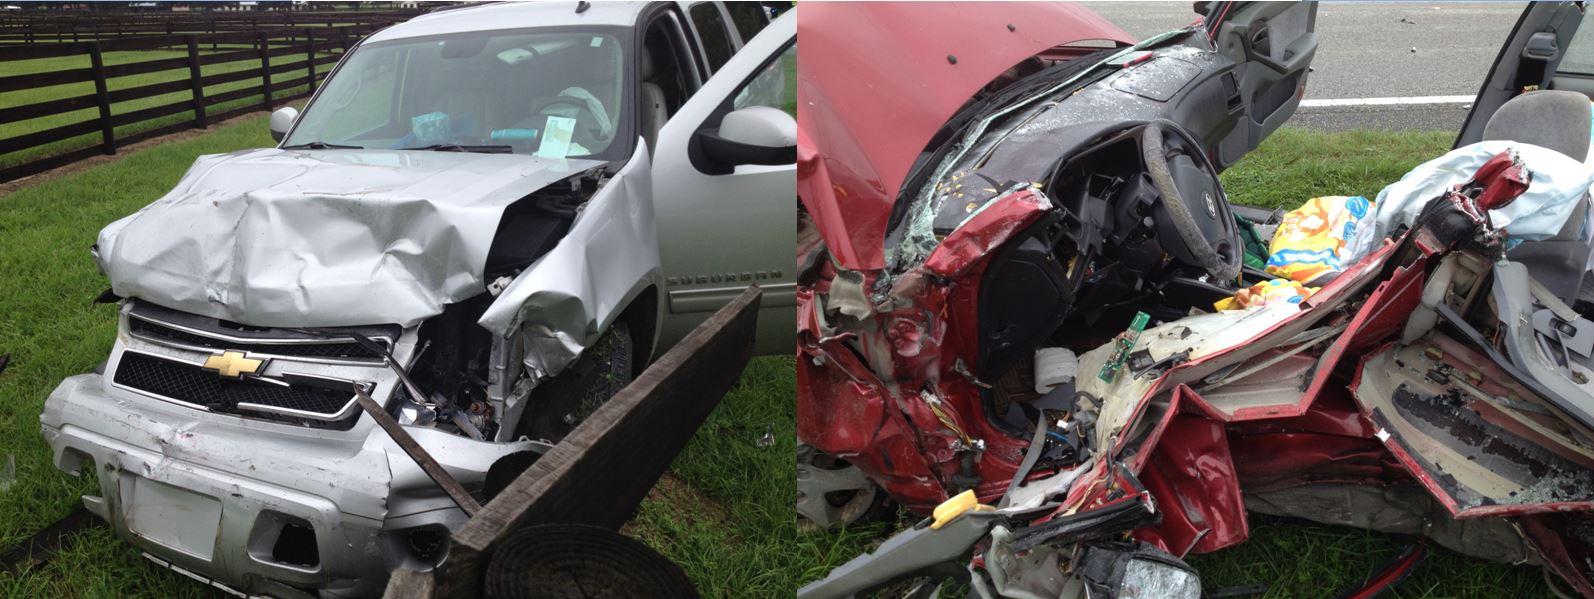 ocala news, marion county news, car crash, fatal crash, car accident, 225a accident